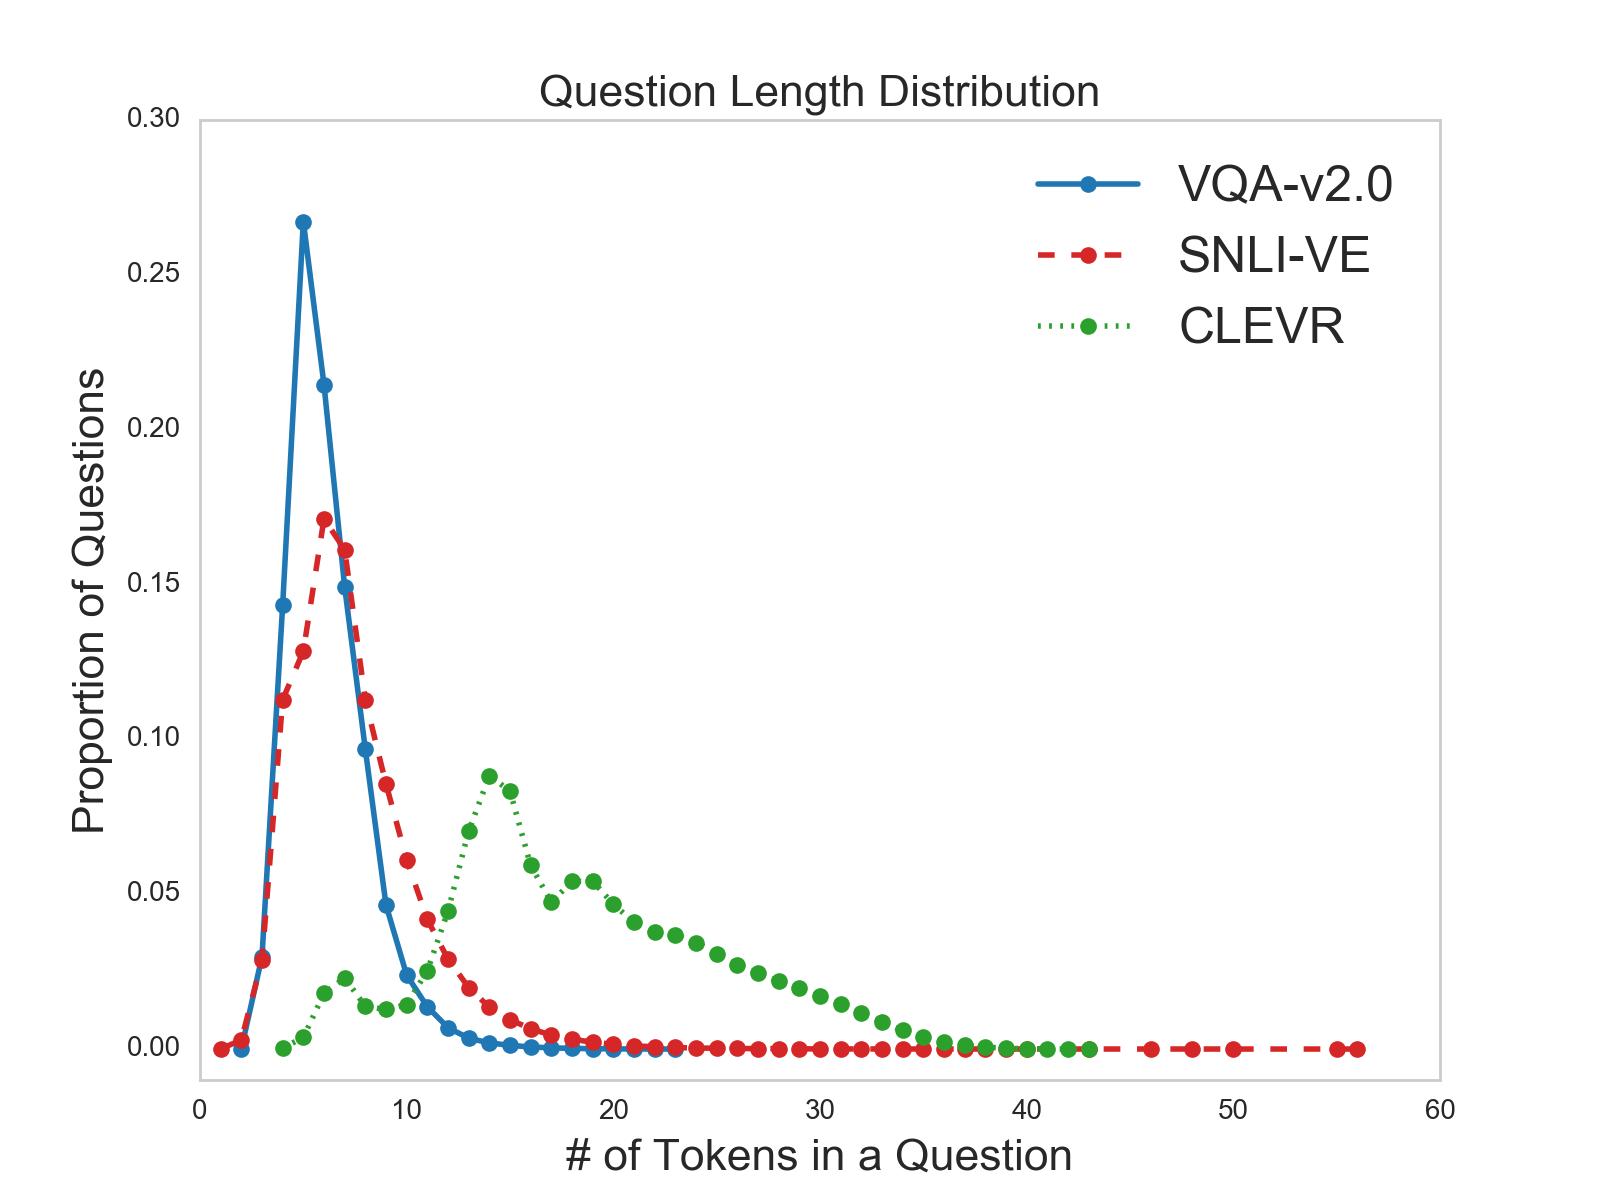 Question length distribution